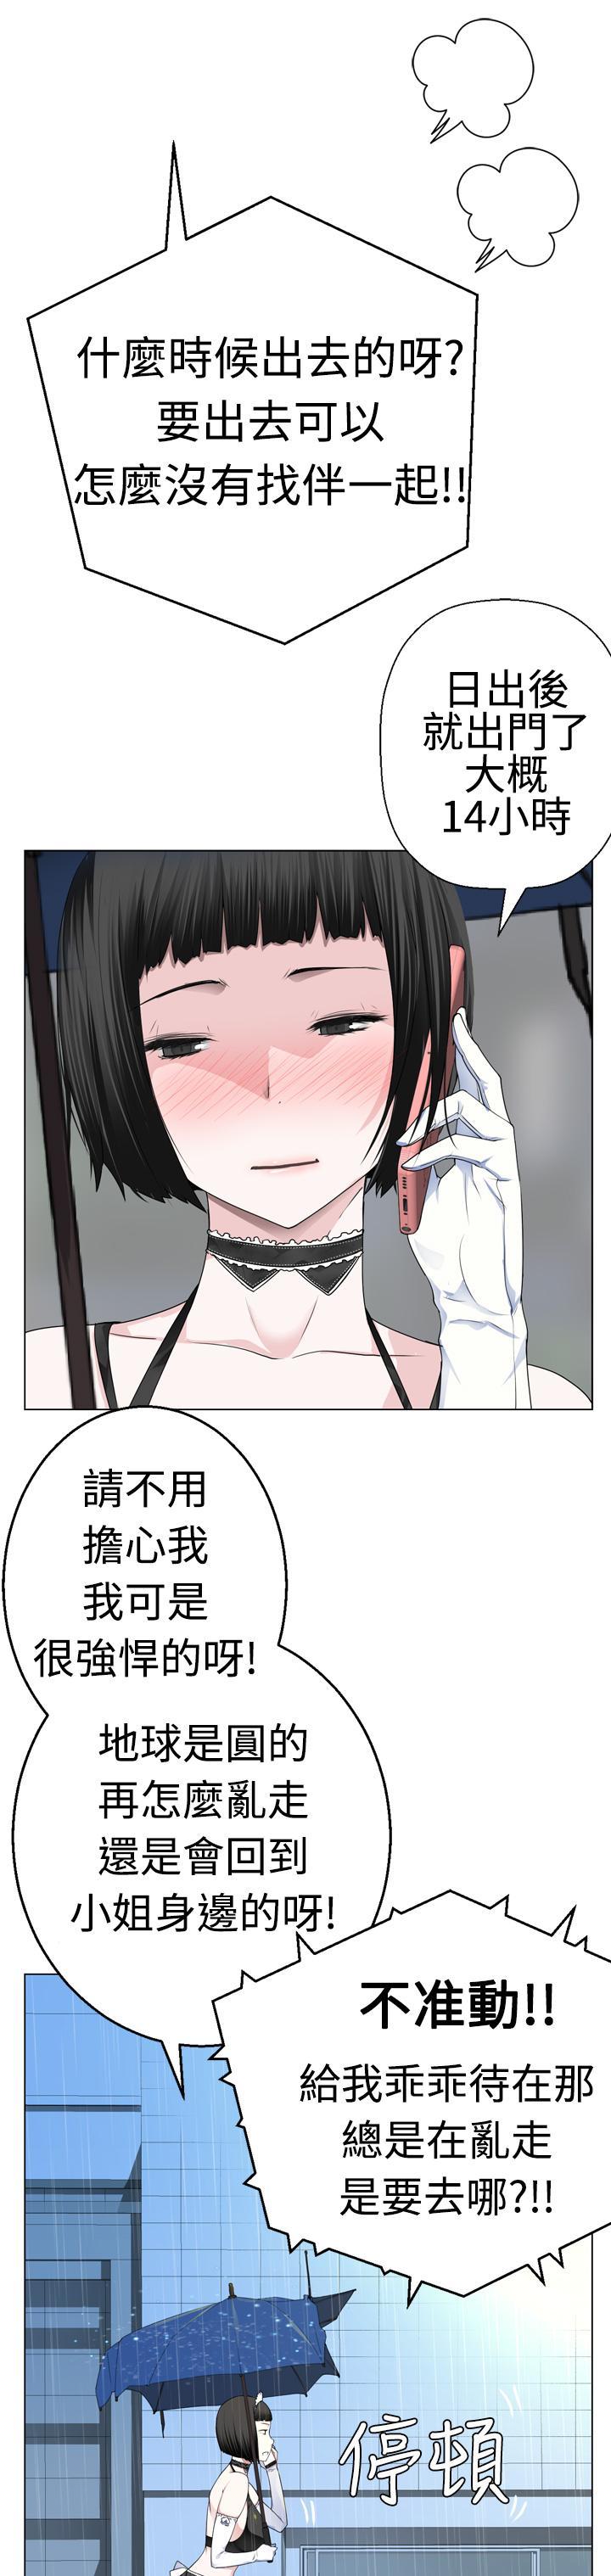 [SOSO] Franken Jo 为爱而生 法兰克赵 Ch.1~19 [Chinese]中文 186